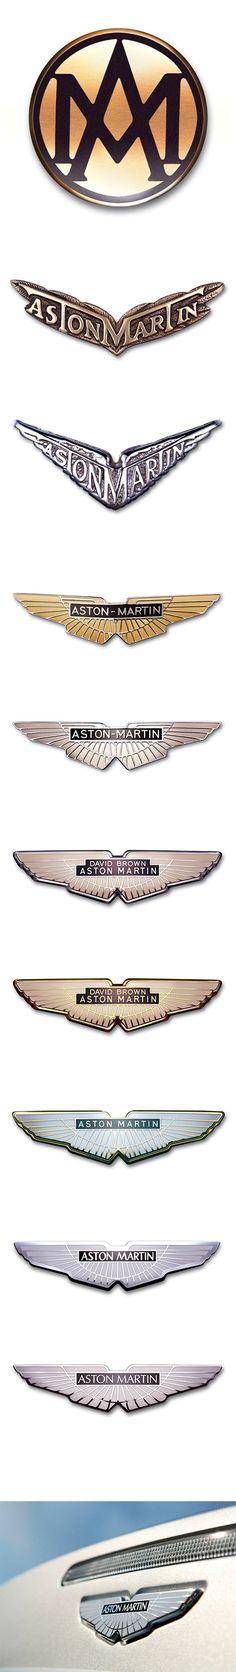 279 Best Car Logos Images On Pinterest Car Logos Car Badges And Logos